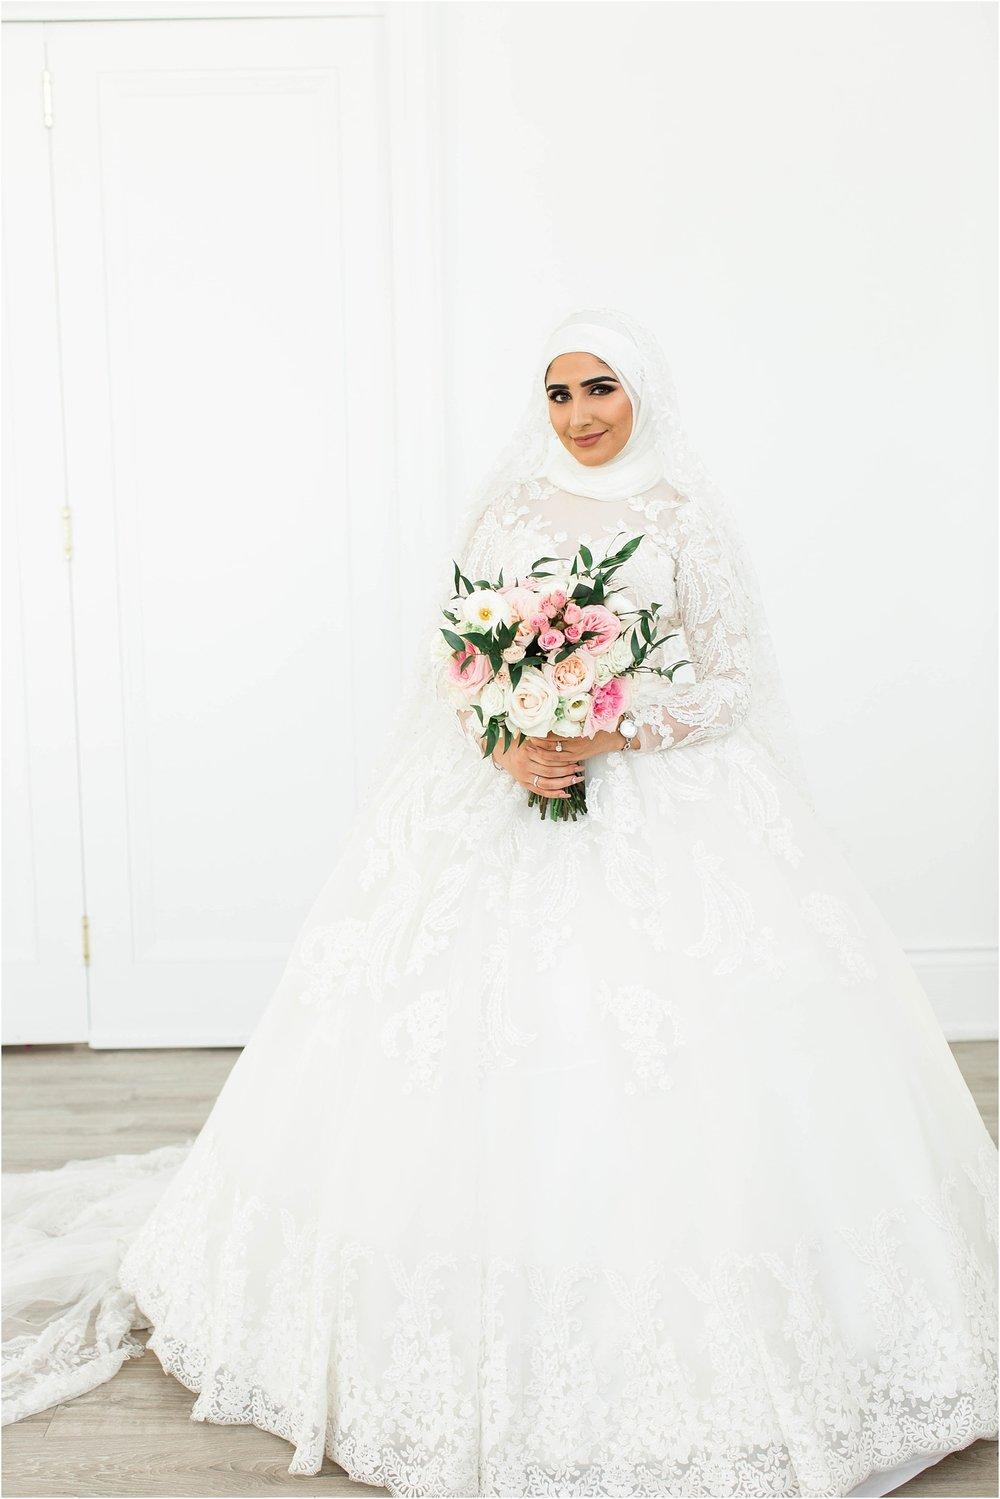 Red-Rose-Convention-Mint-Room-Wedding-Toronto-Mississauga-Brampton-Scarborough-GTA-Pakistani-Indian-Wedding-Engagement-Photographer-Photography_0097.jpg